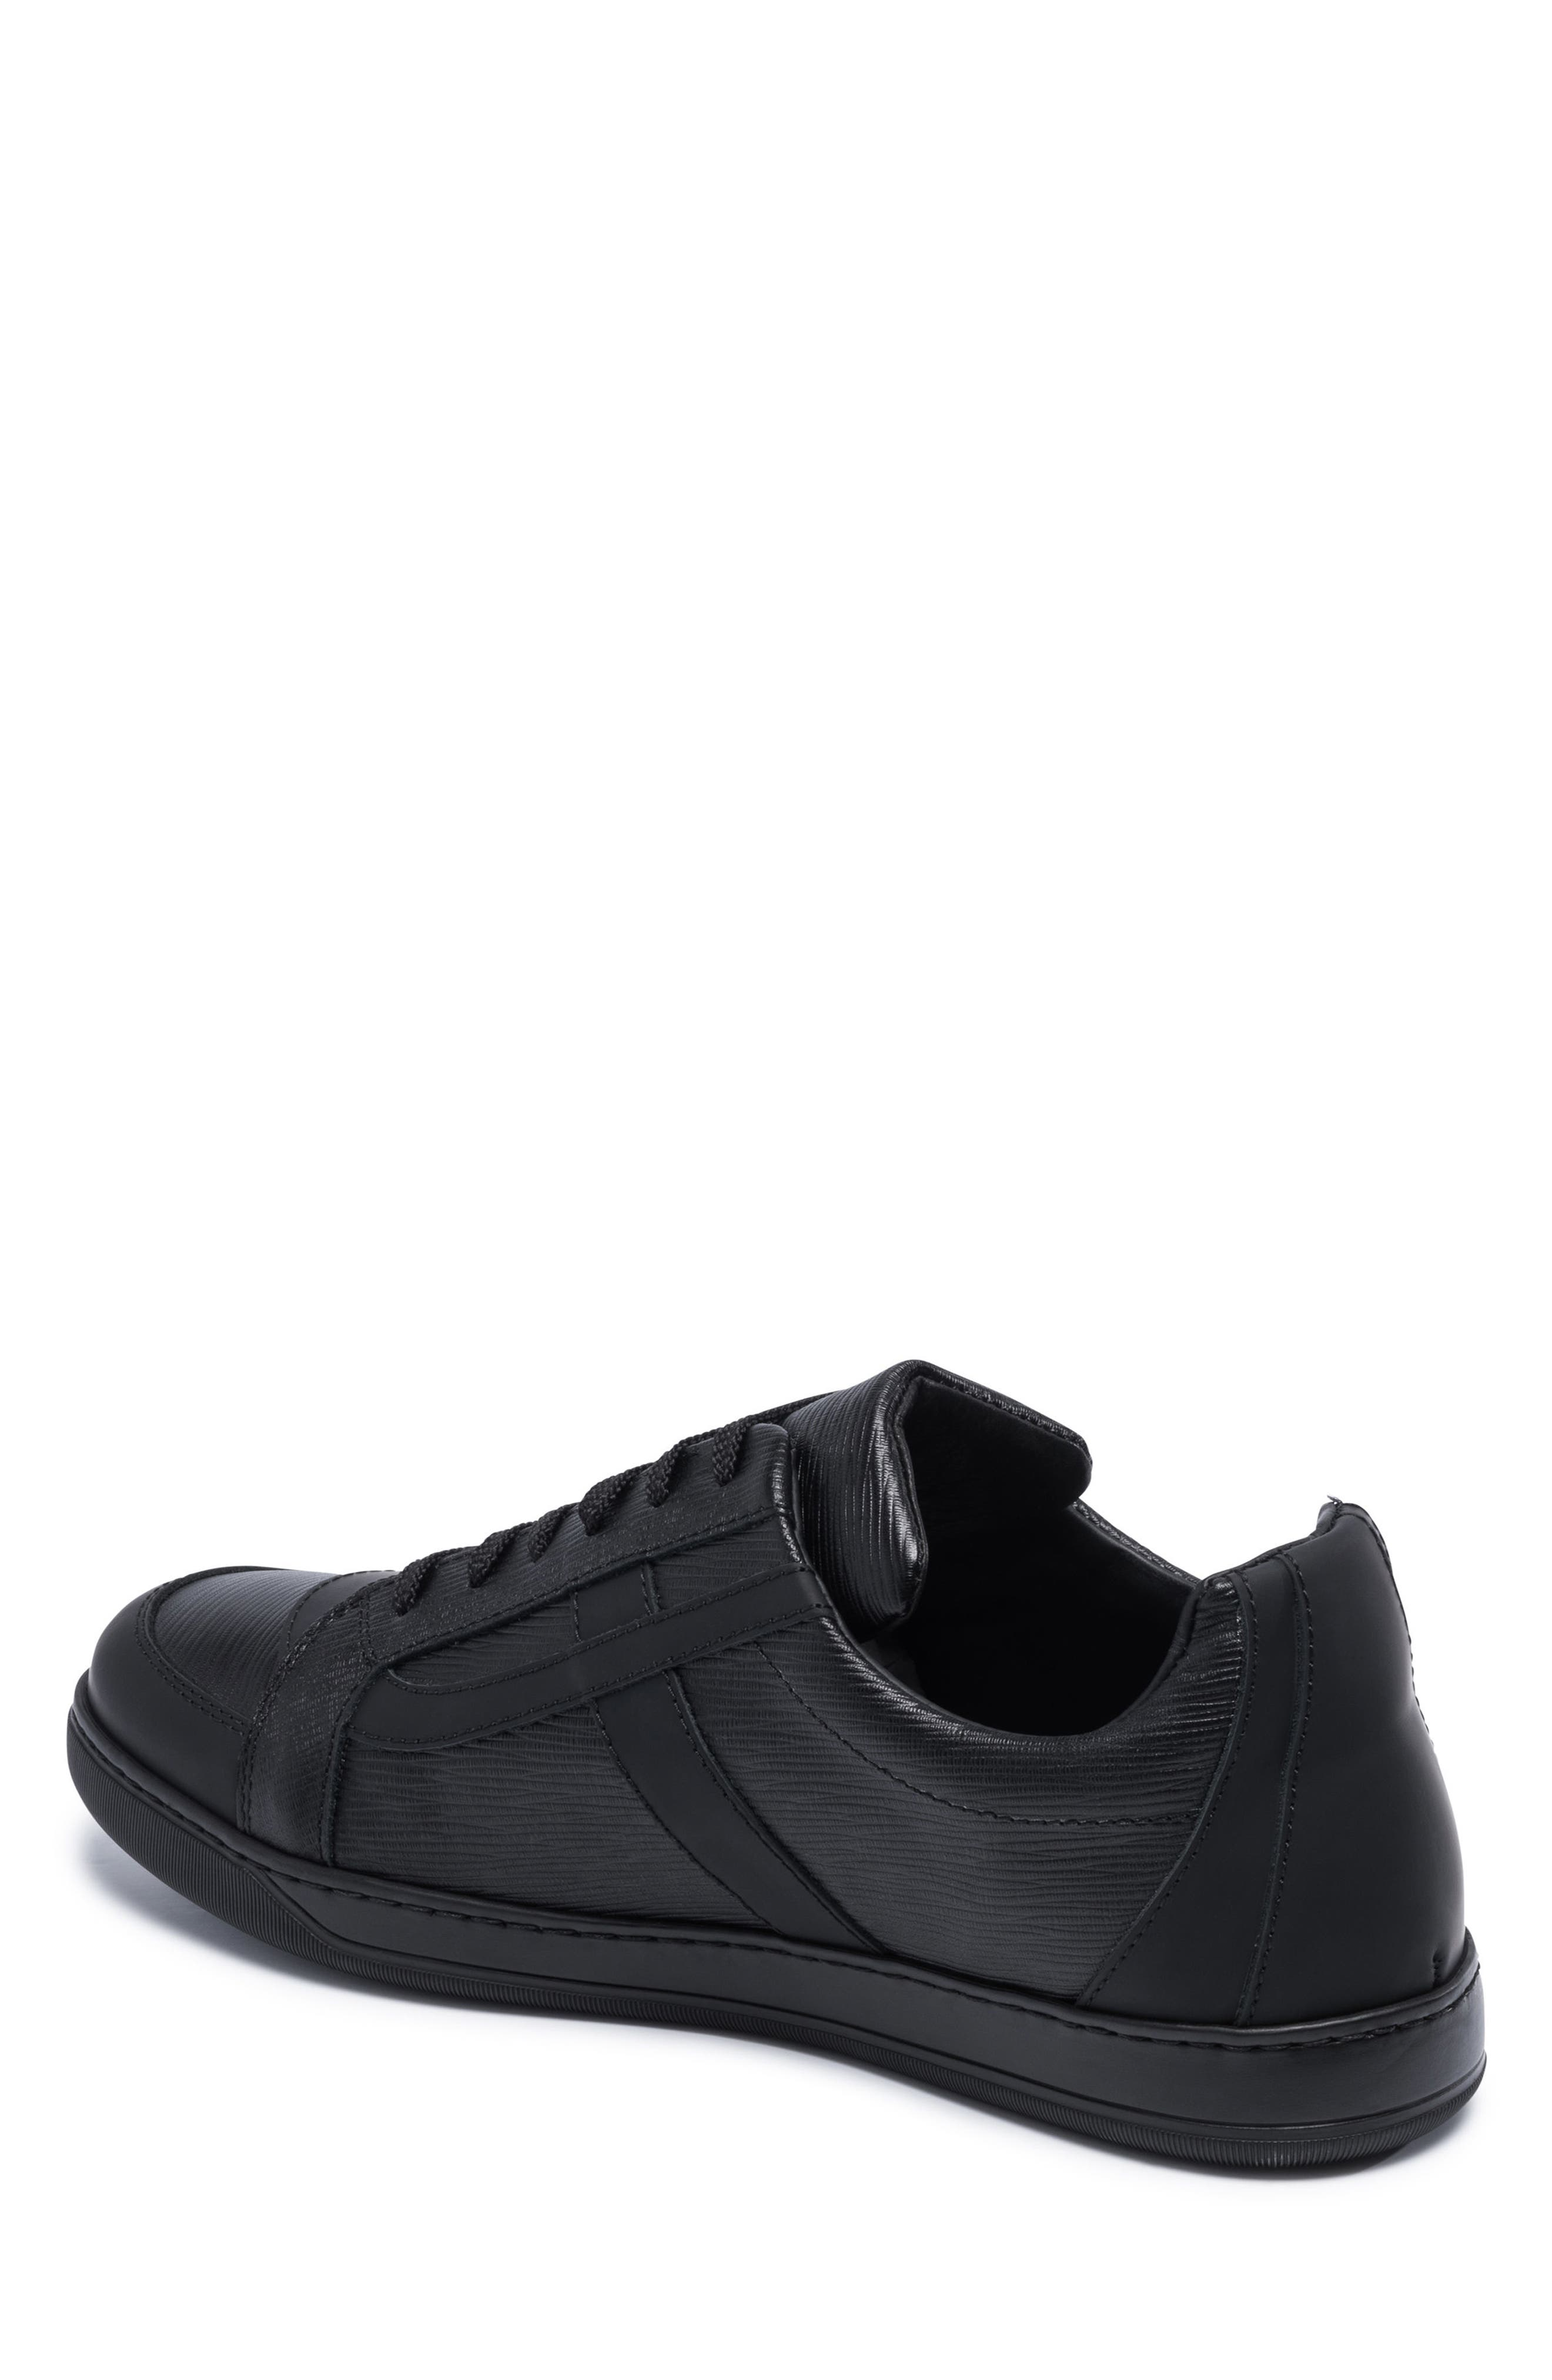 Novecento Sneaker,                             Alternate thumbnail 2, color,                             Navy Leather